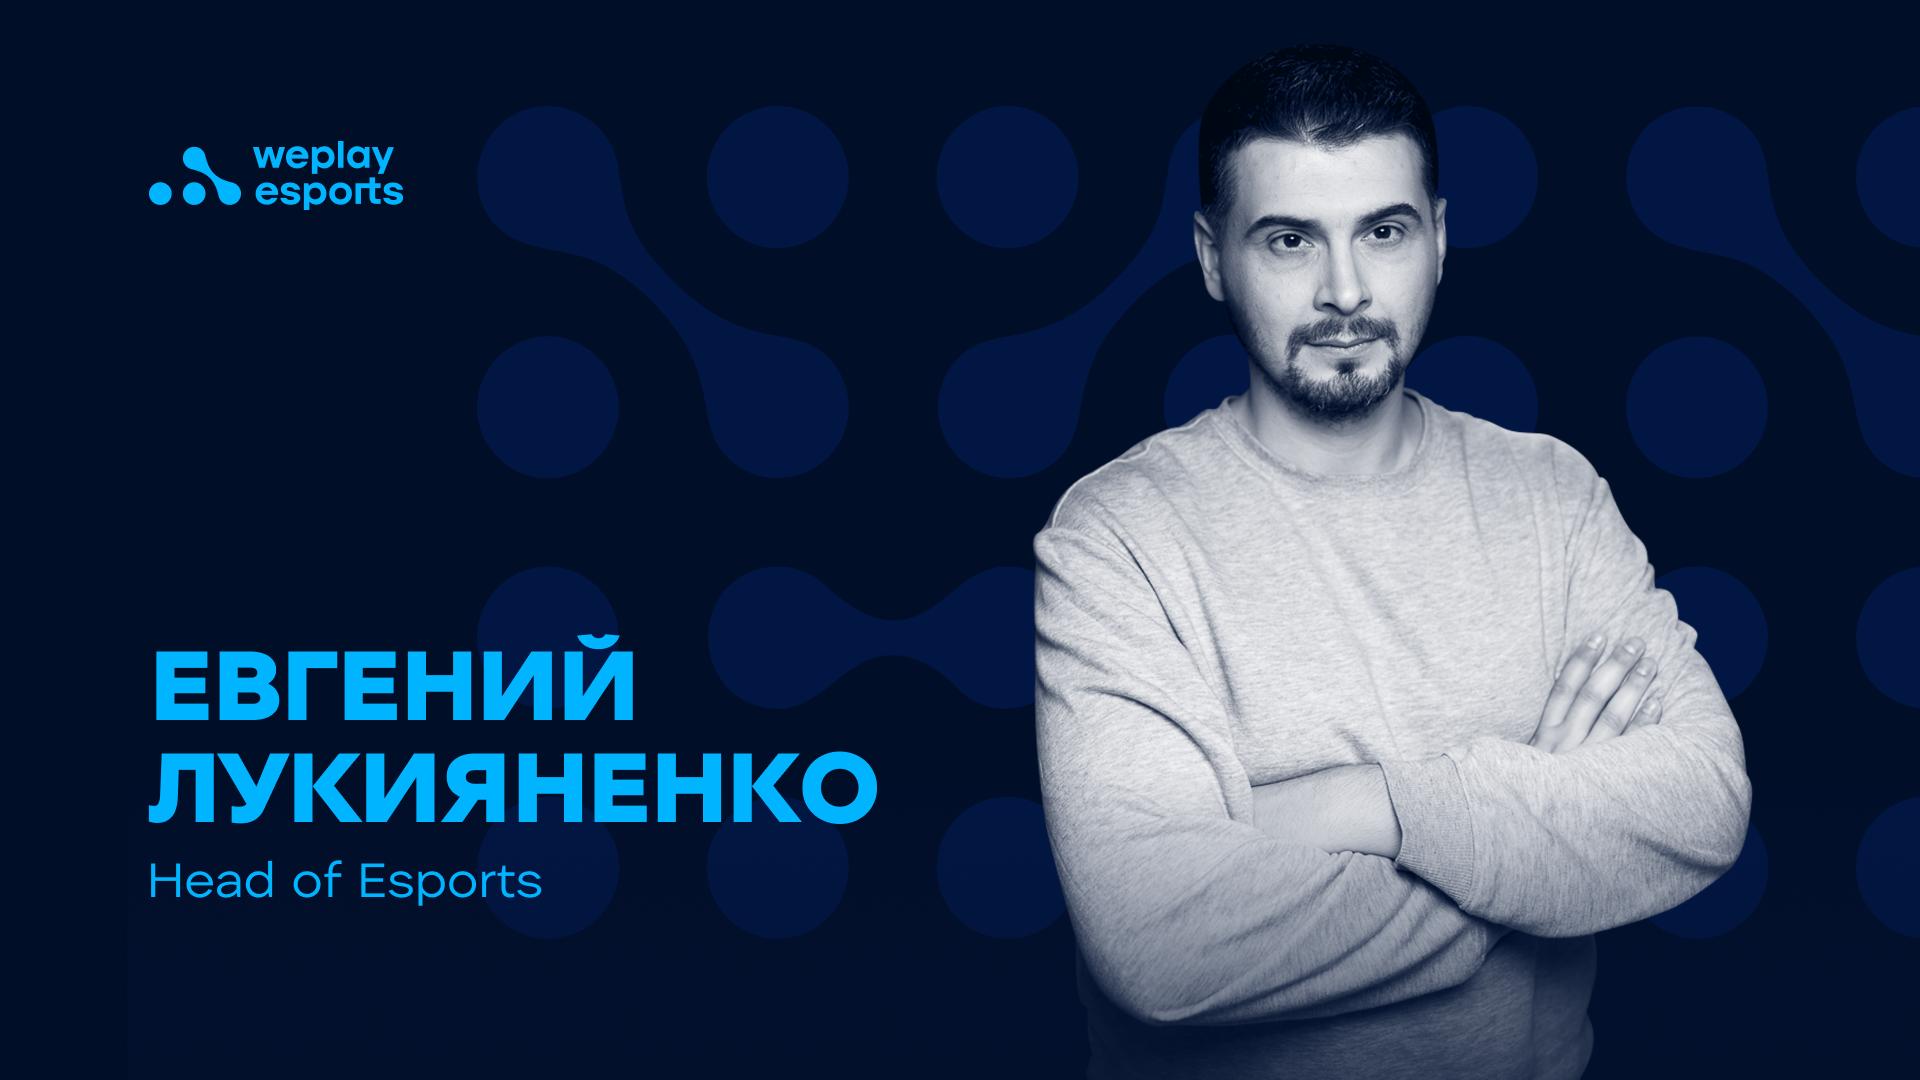 Евгений Лукияненко, руководитель отдела киберспорта WePlay Esports. Фото: WePlay Holding